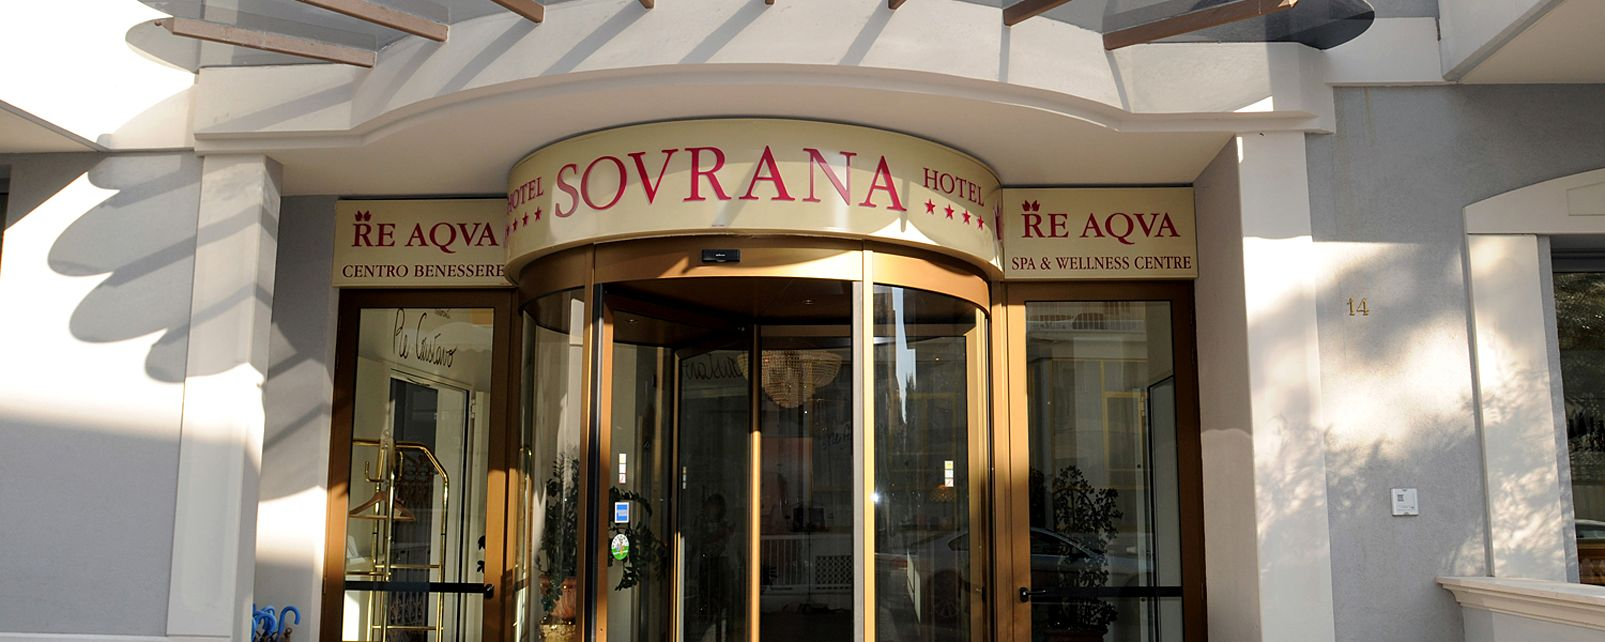 Hôtel Sovrana